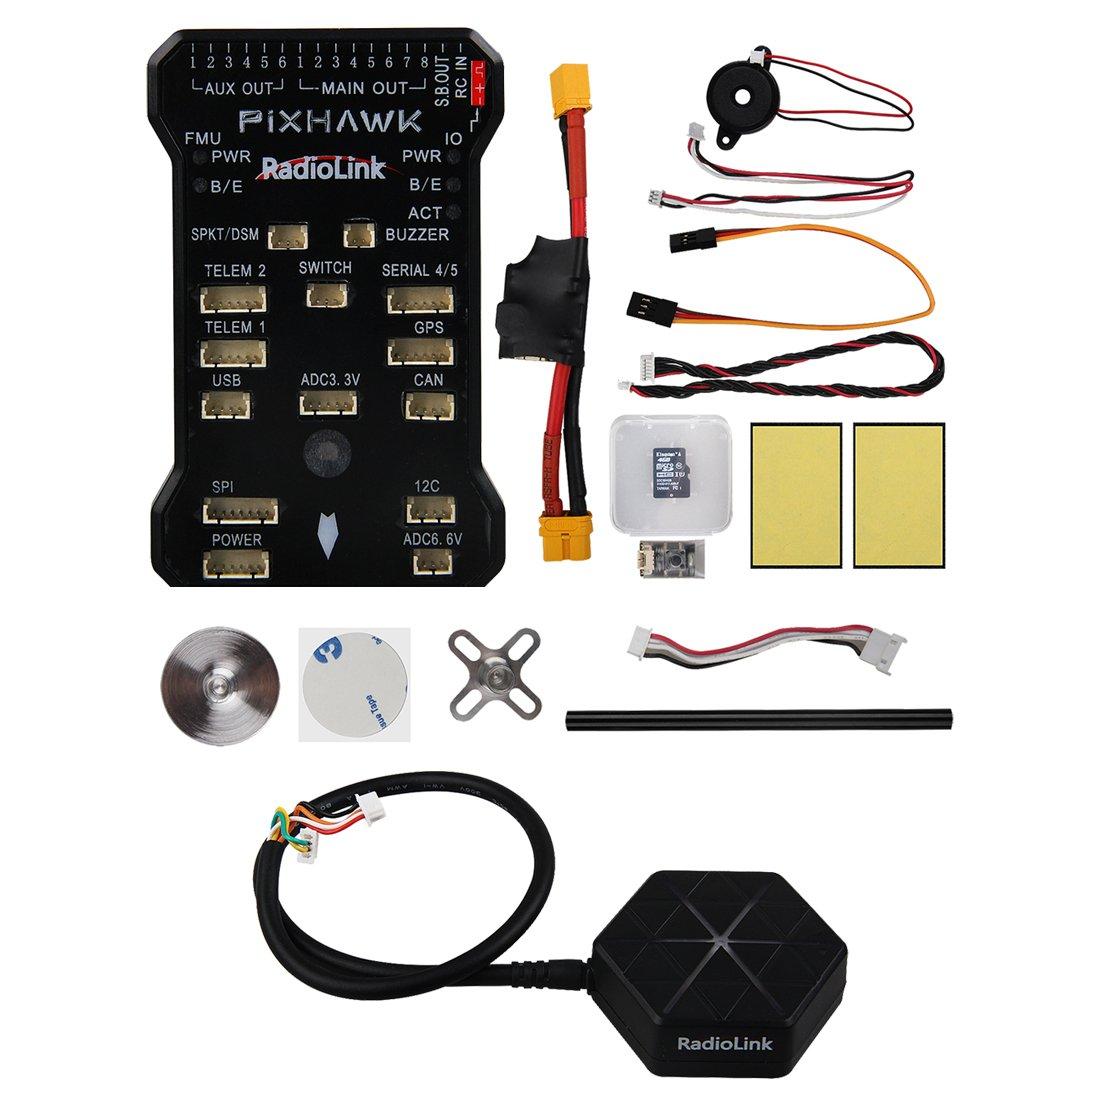 Amazon.com: RadioLink Pixhawk PX4 32 Bit ARM Flight Controller + ...